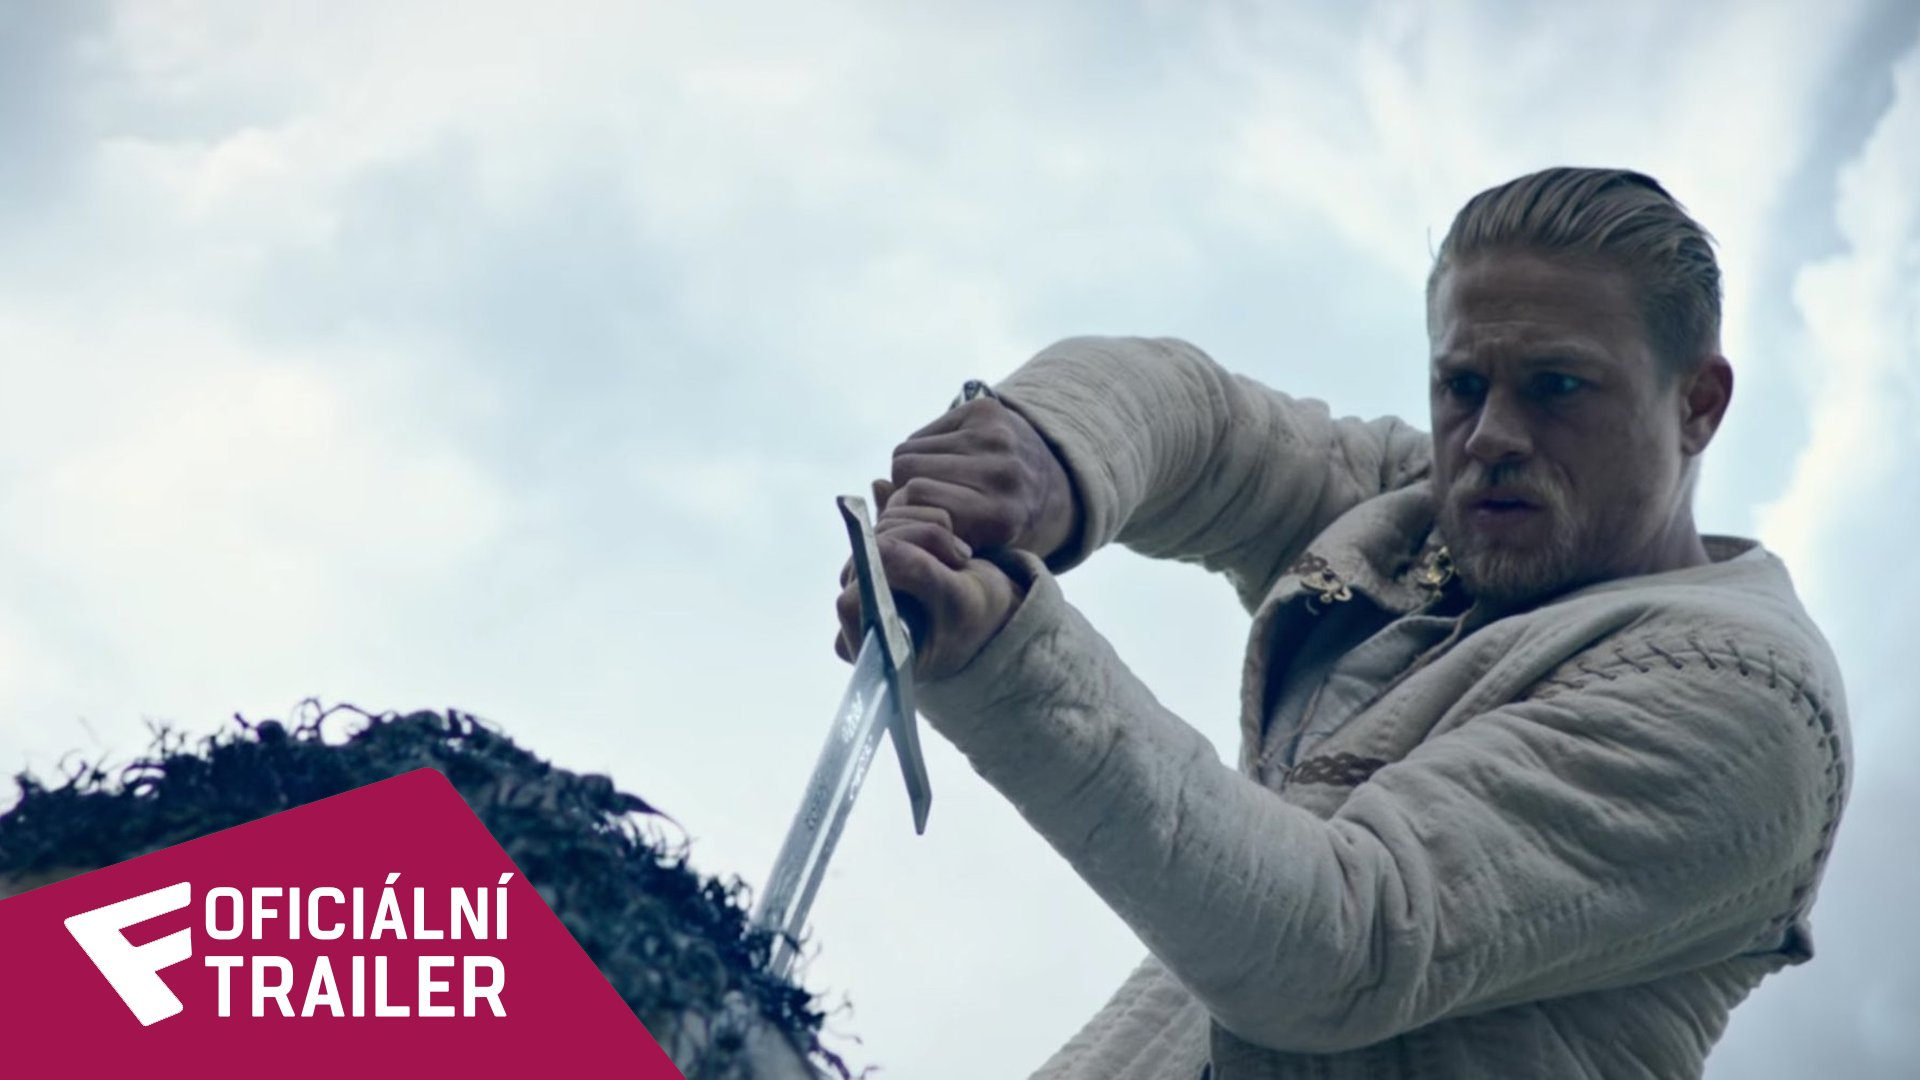 Král Artuš: Legenda o meči - Oficiální Trailer | Fandíme filmu